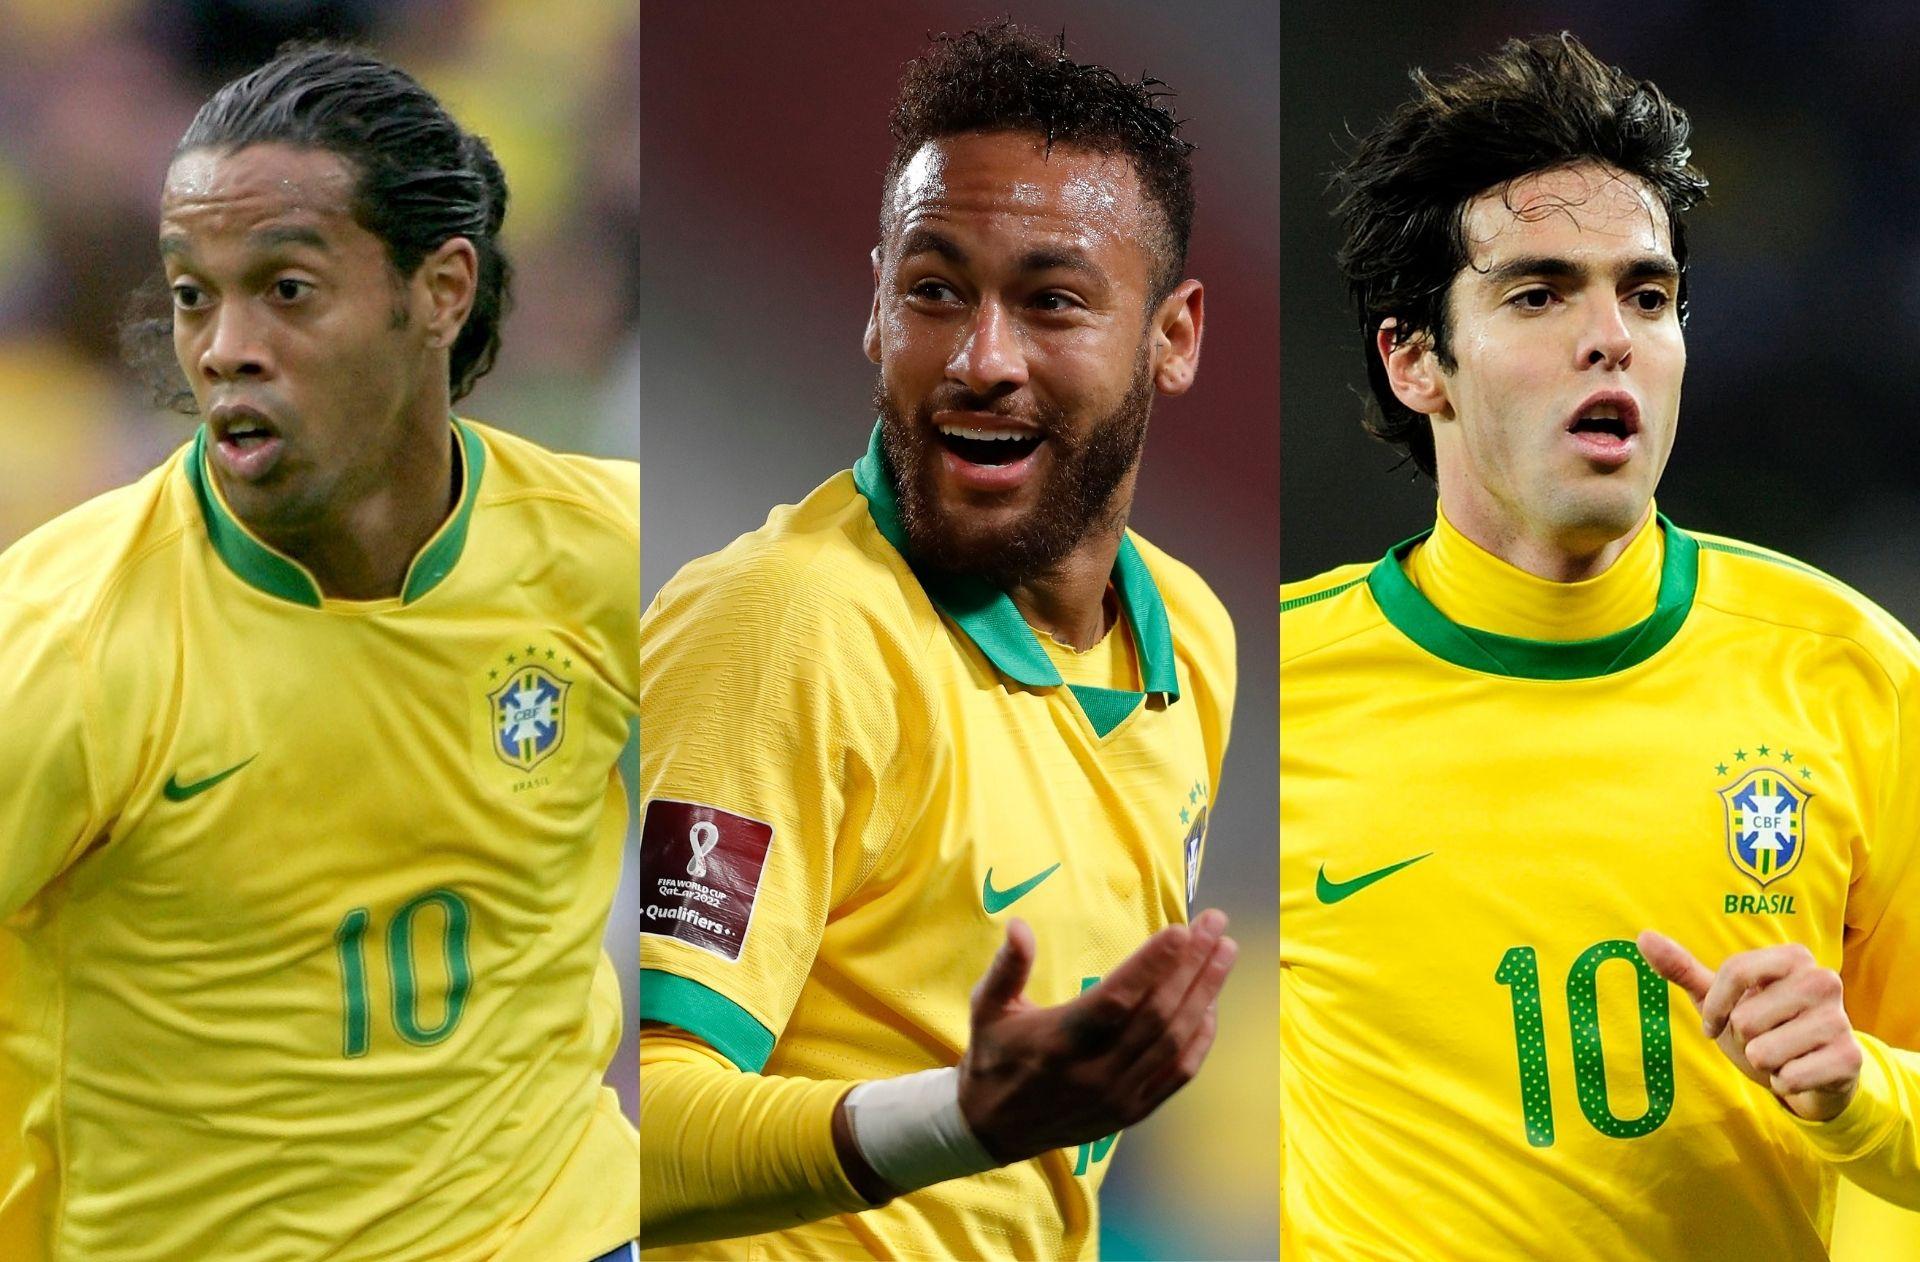 Ronaldinho, Neymar, Kaka - Brazil